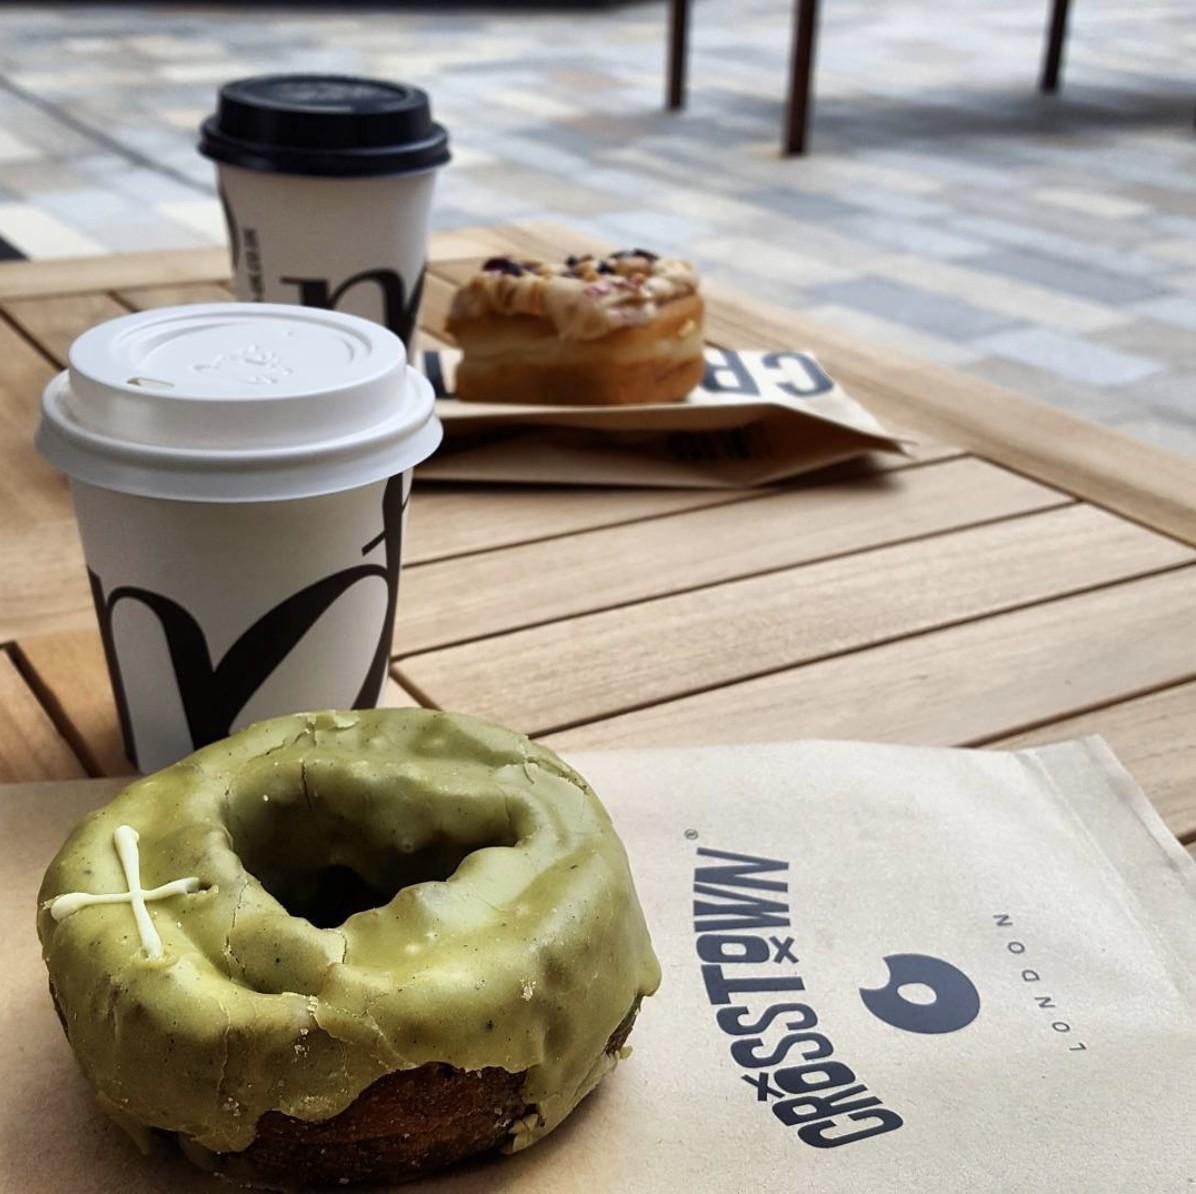 Doughnuts, Donuts, Food, Treats, Foodie, Foodgasm, Coffee, Time for Coffee, Coffee Time, Notes Coffee, Crosstown Doughnuts, London, Blog A Book Etc, Fay, Fit or Fat